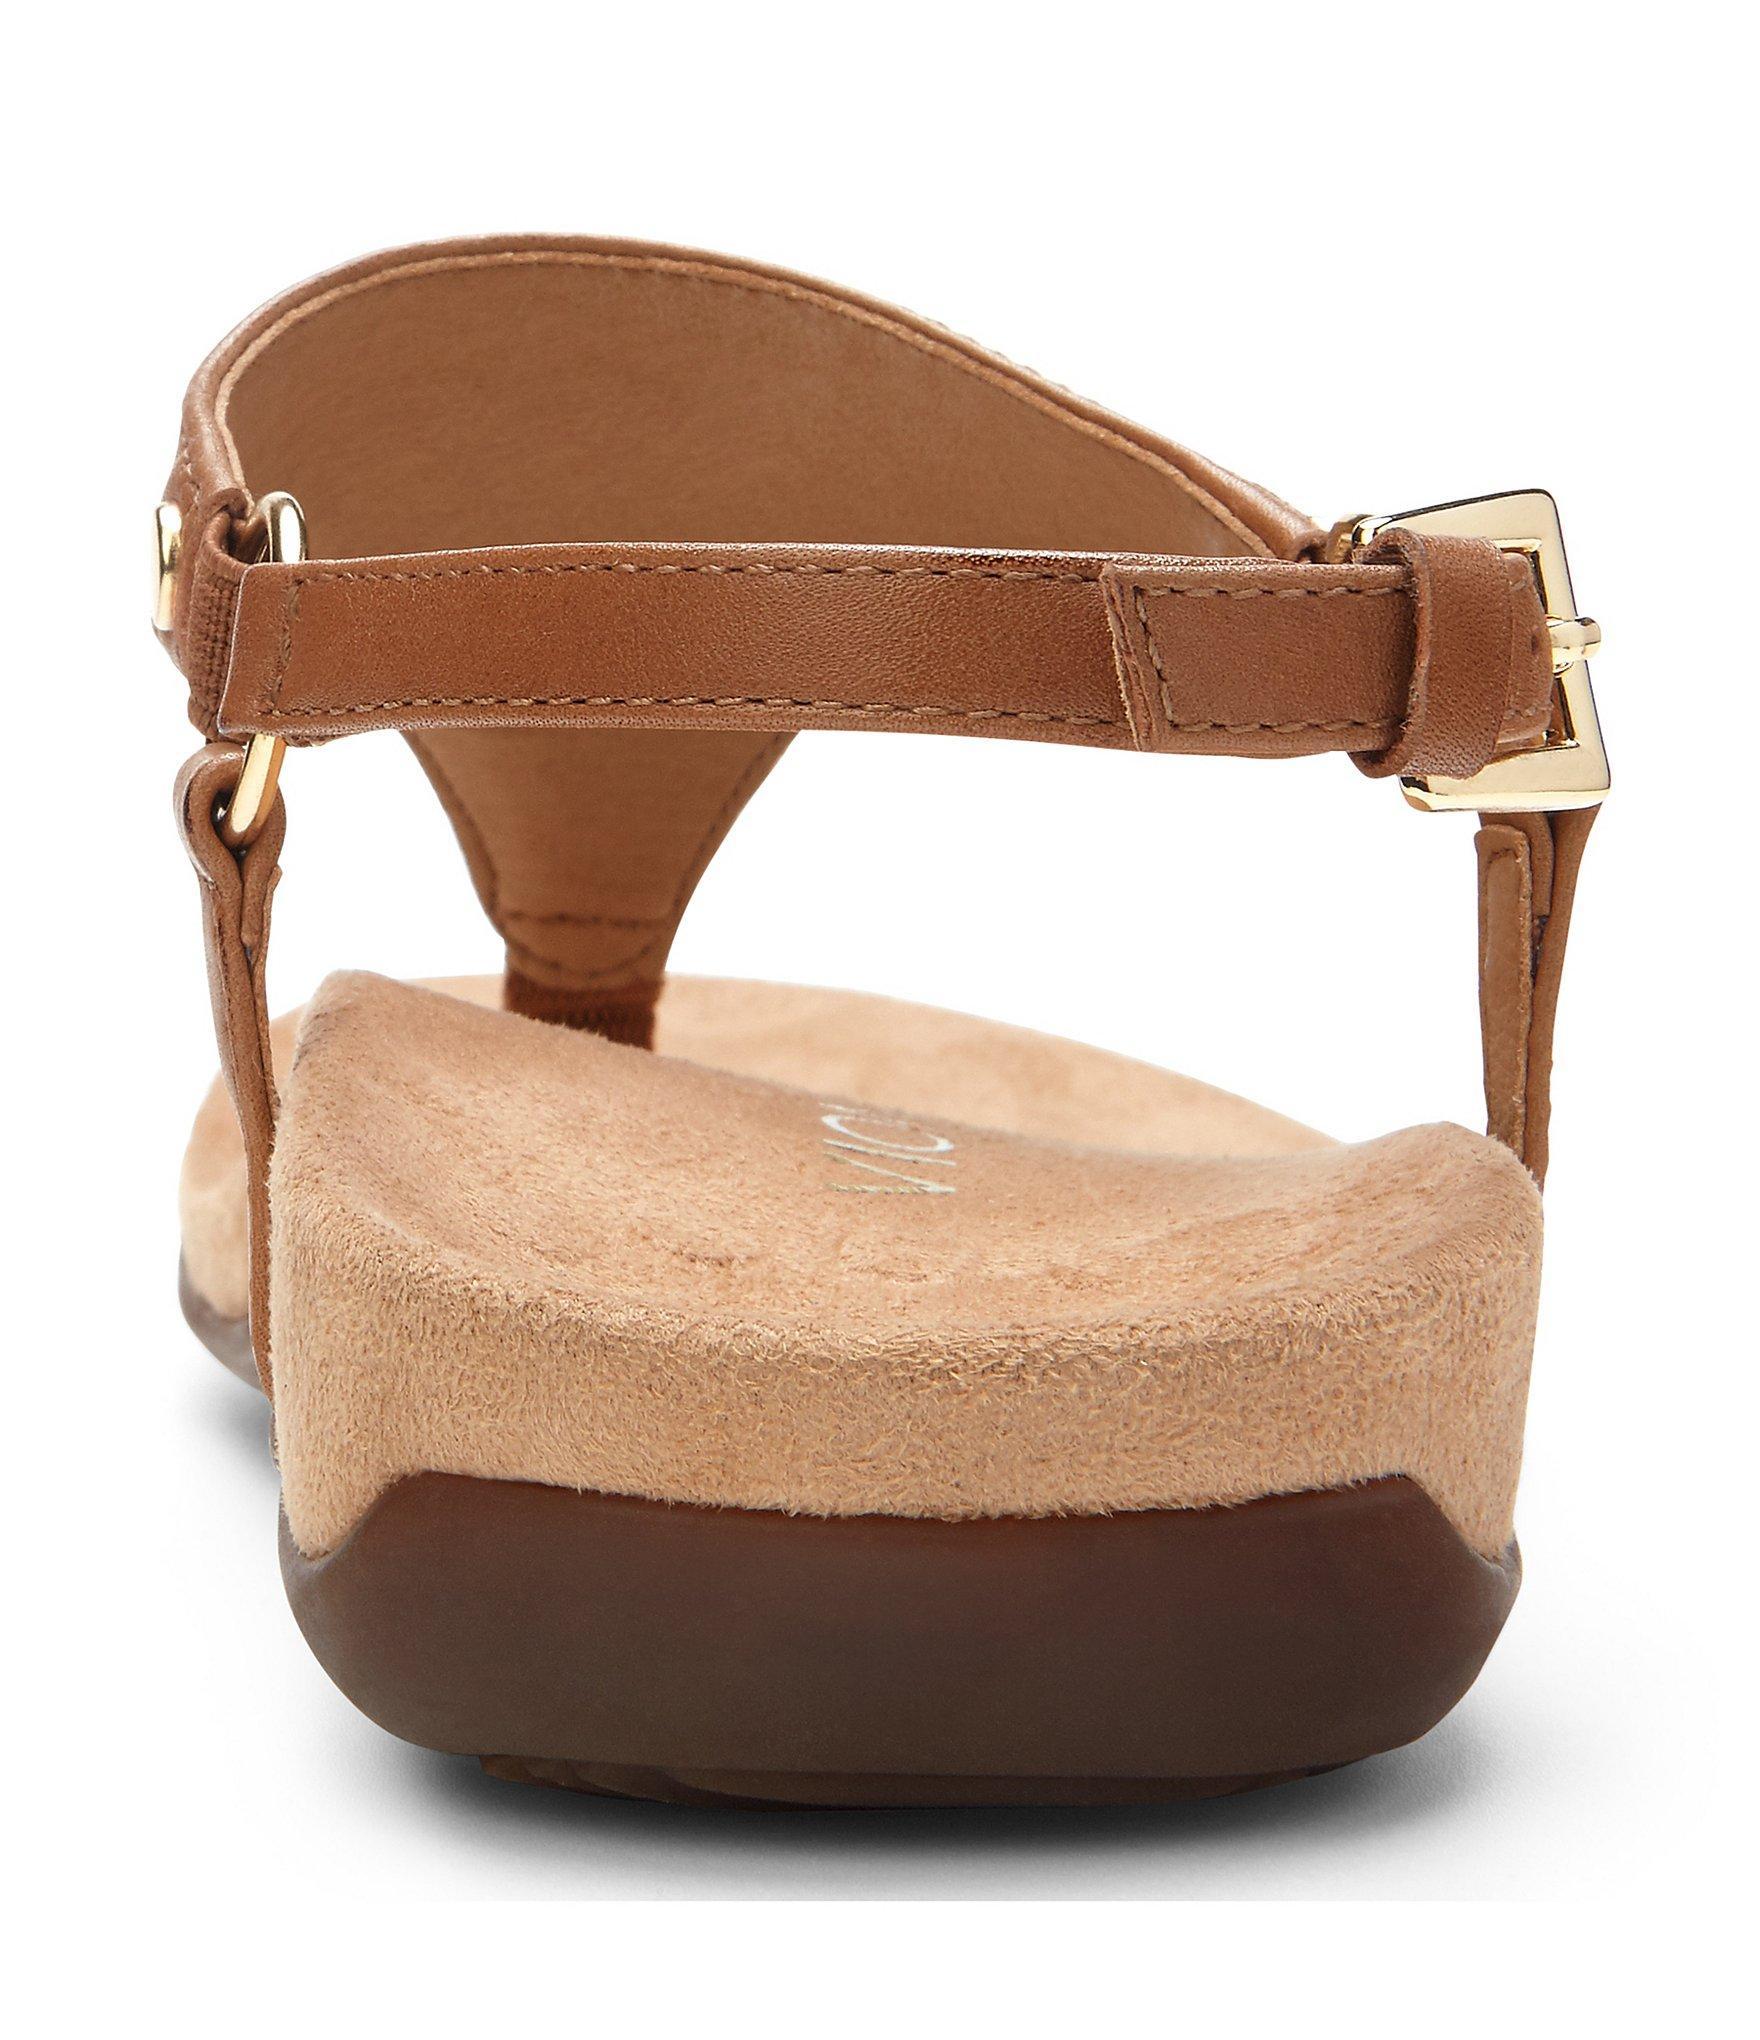 ba55f8fbcf9 Vionic - Brown Kirra Leather Thong Sandals - Lyst. View fullscreen